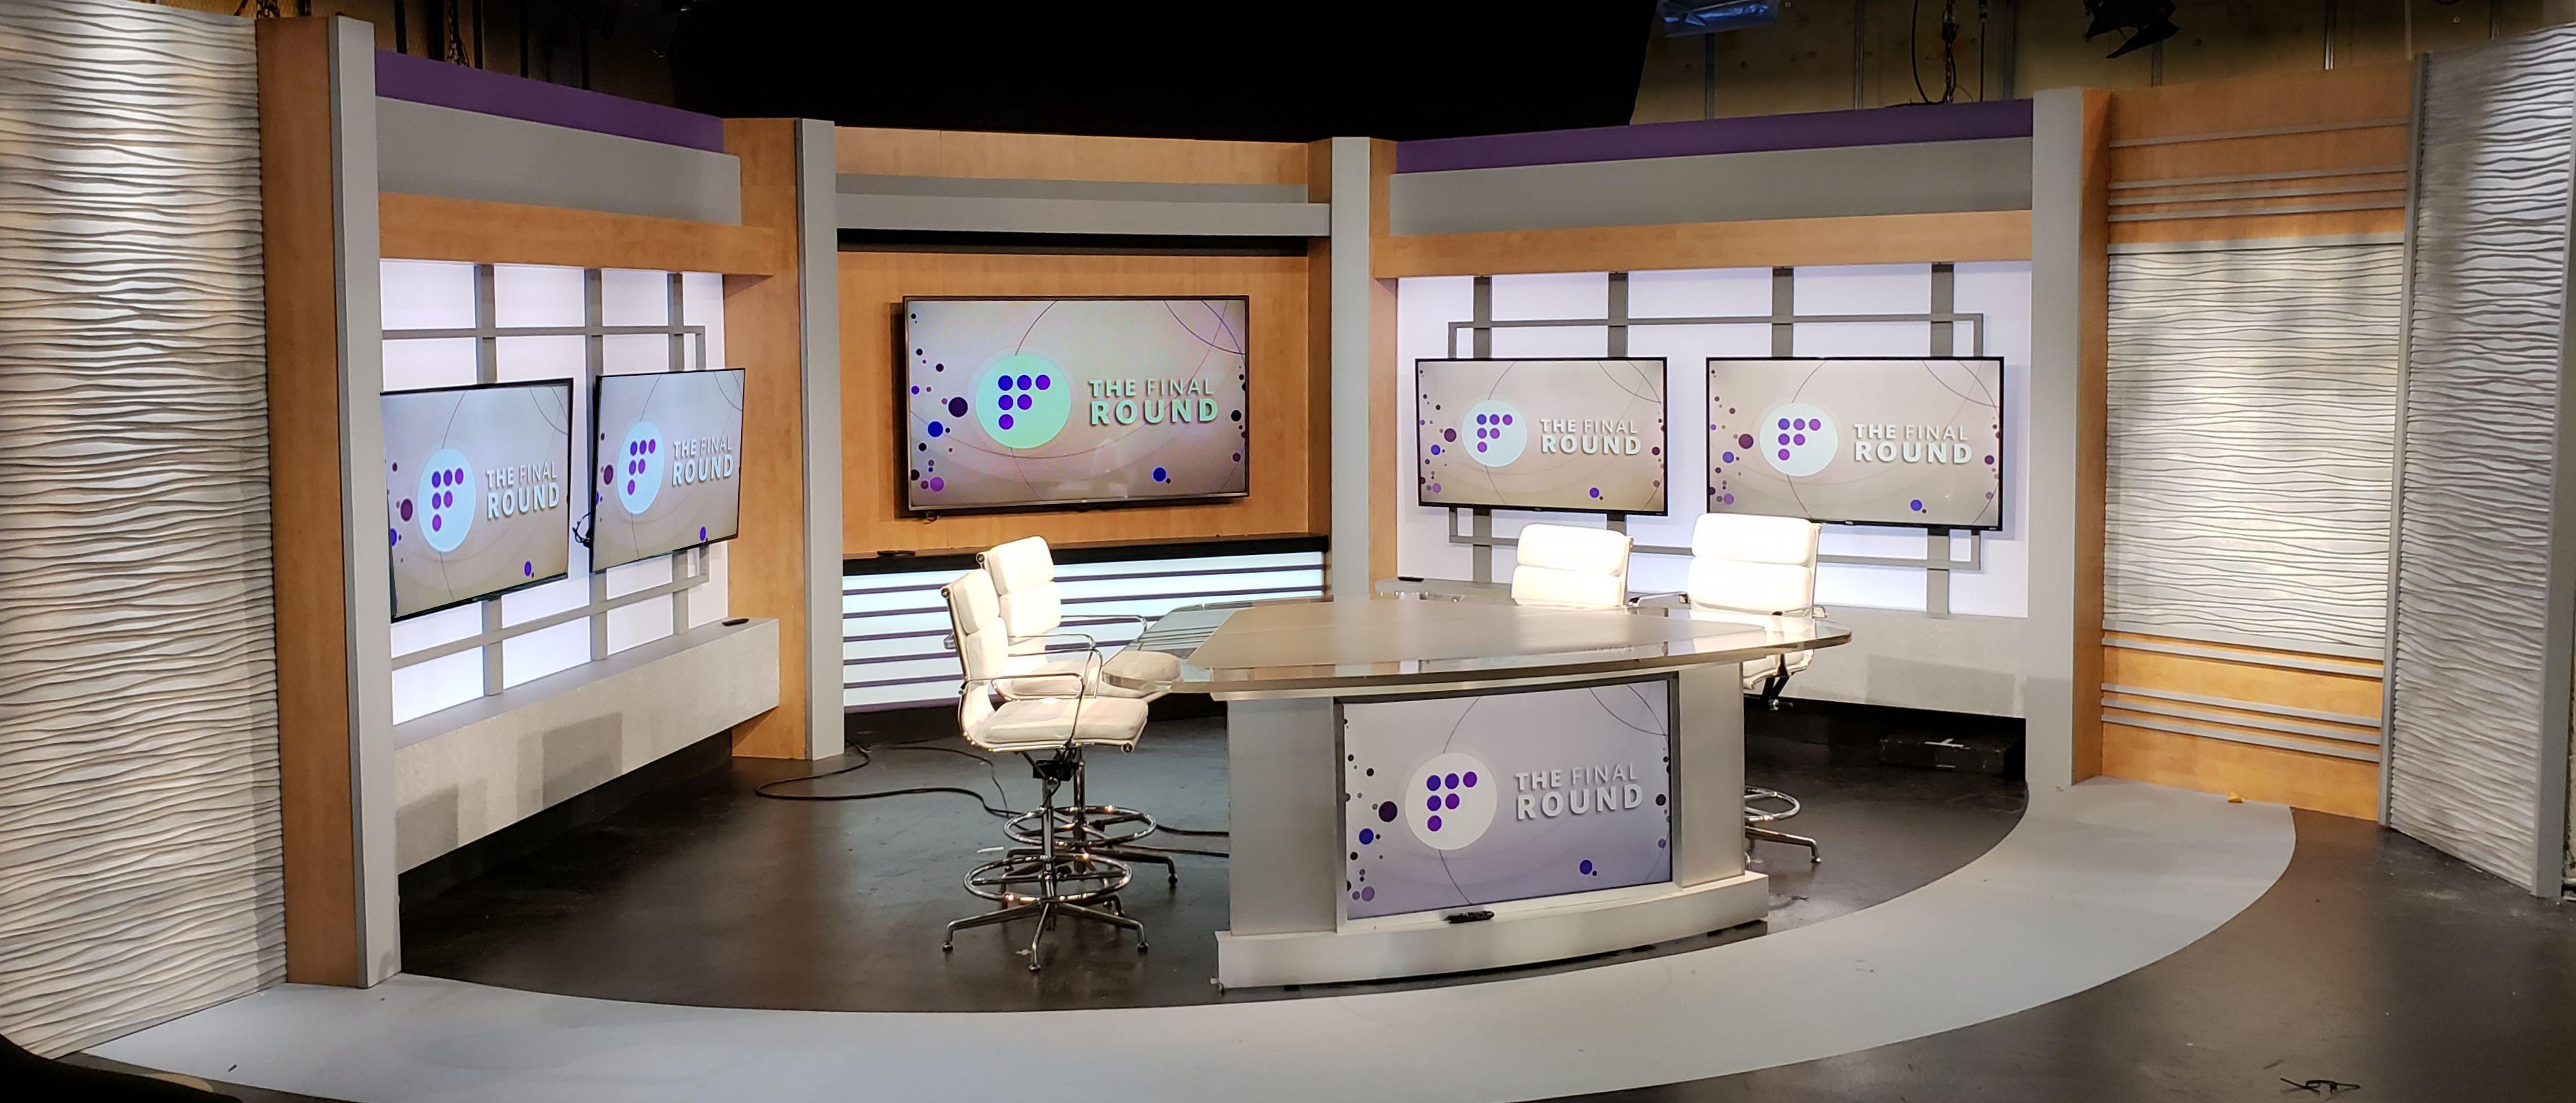 Yahoo Financial news ready 1